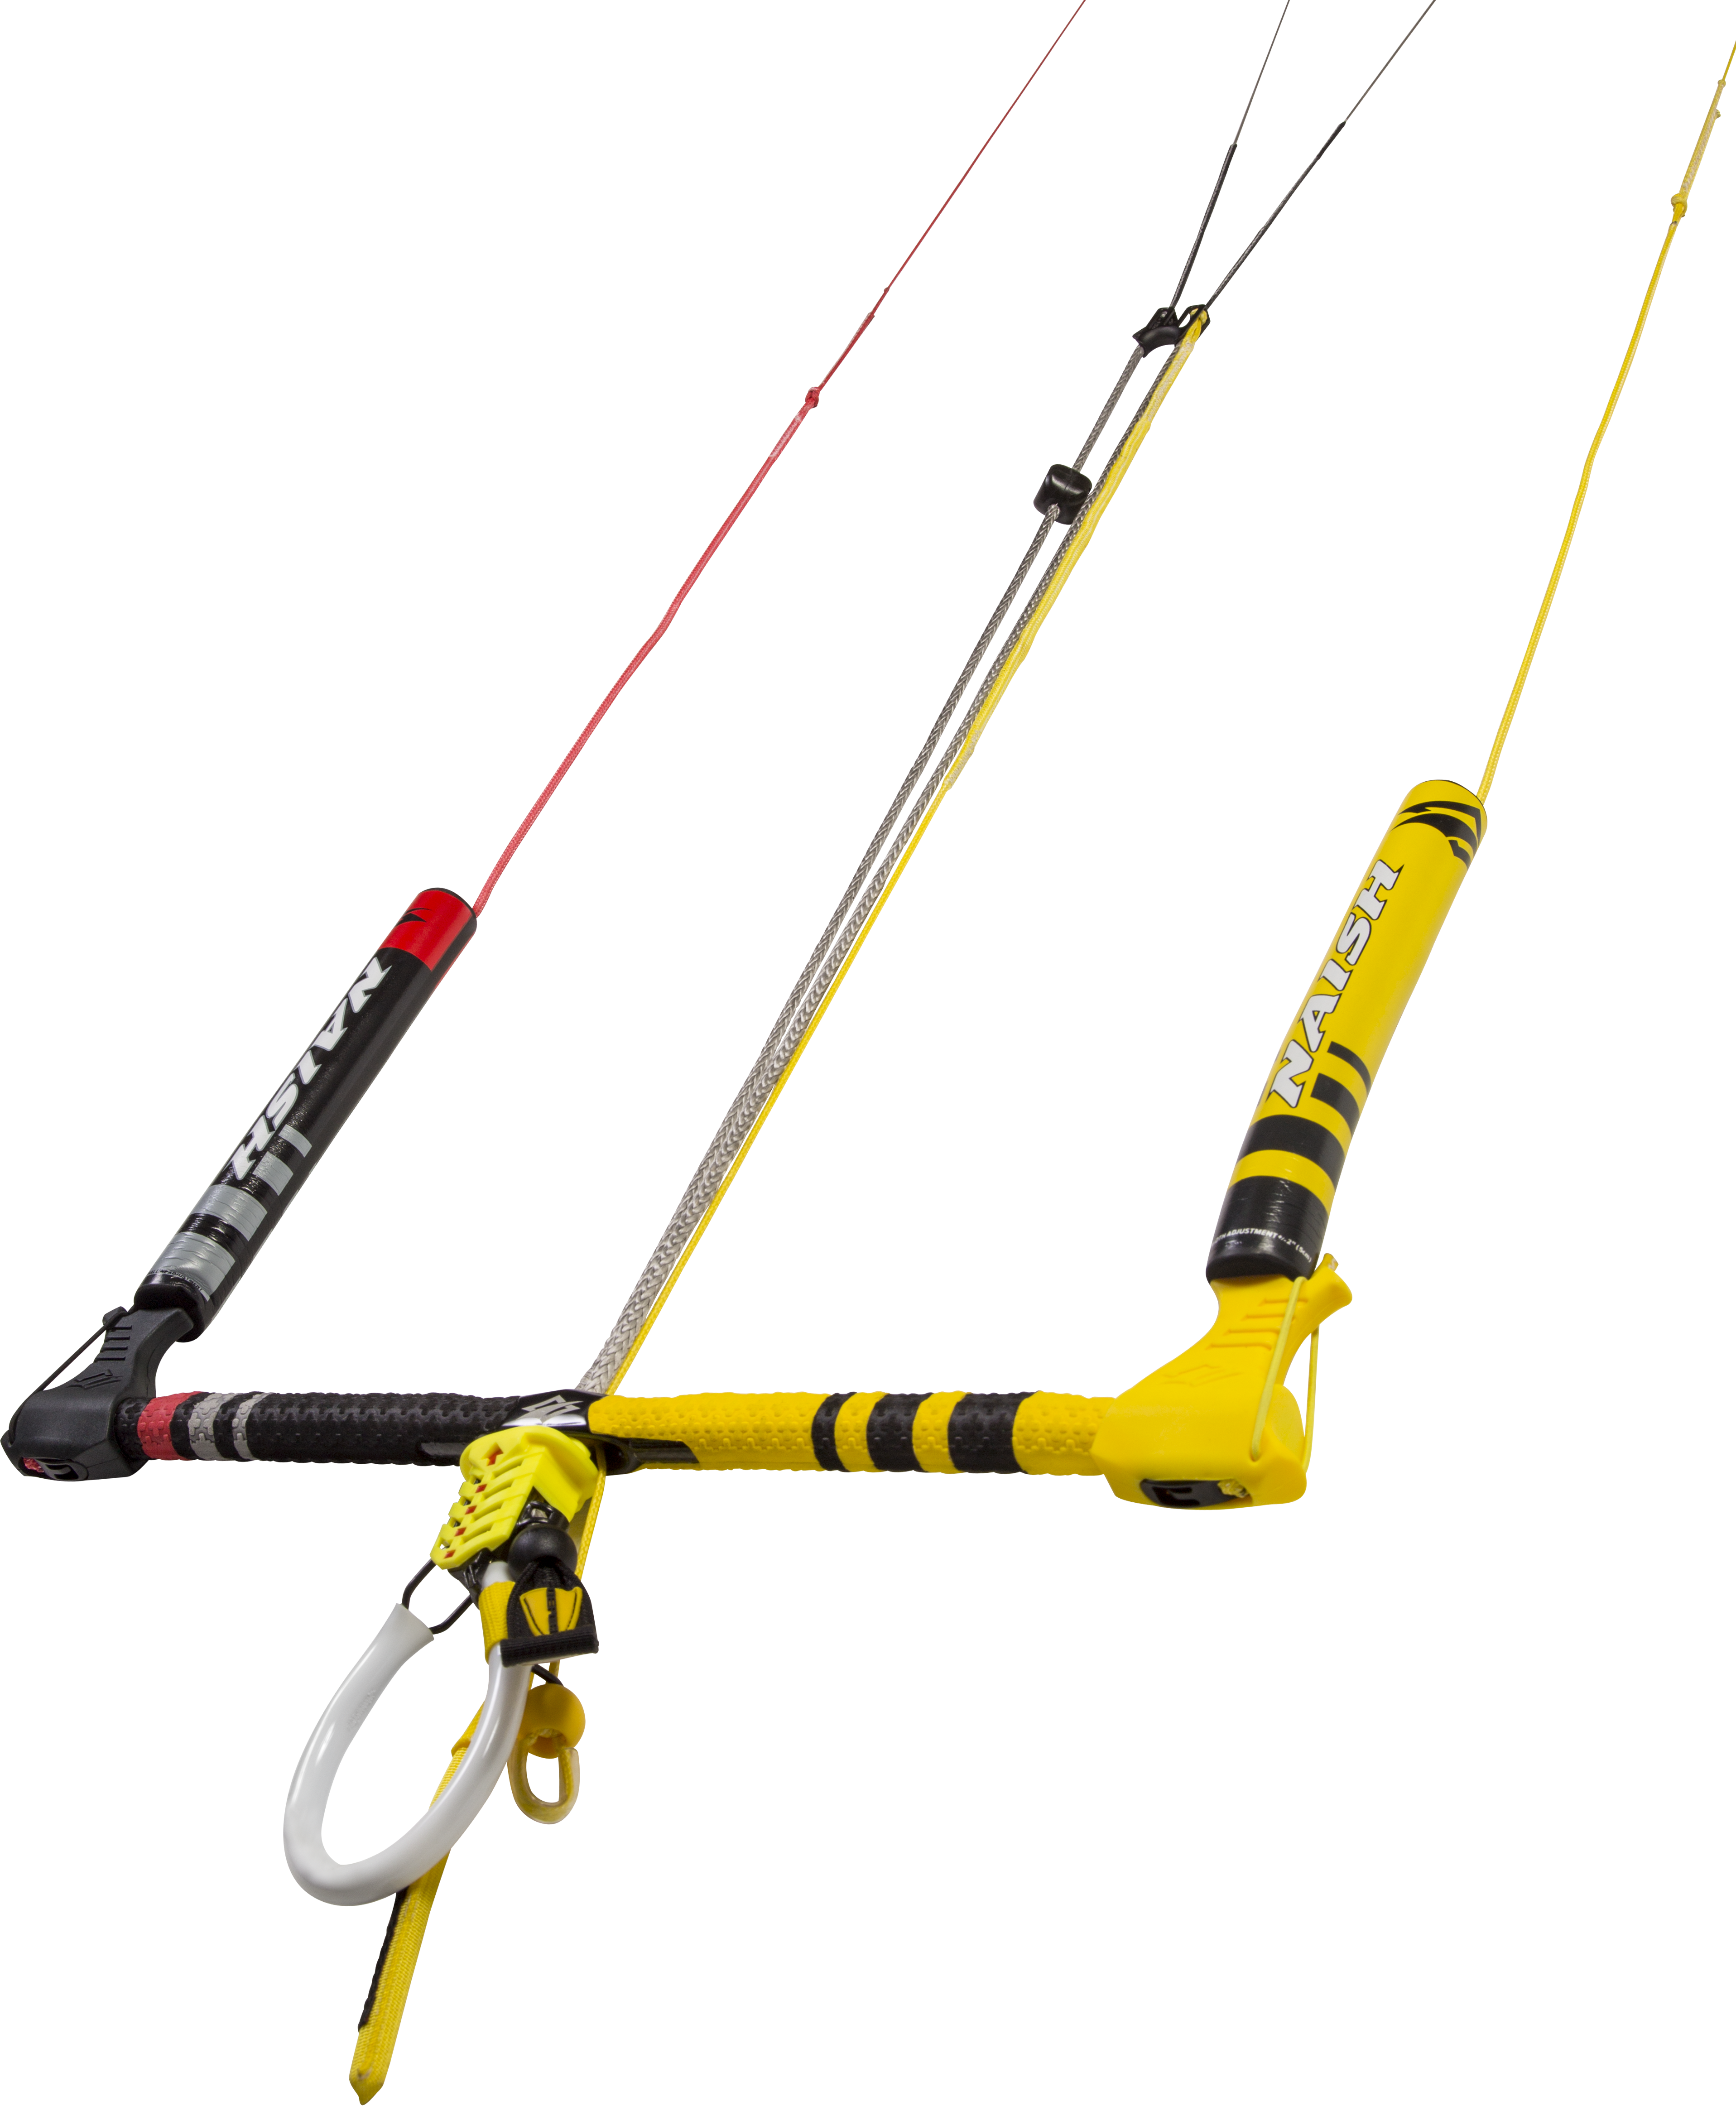 Kitesurfen Weiterer Wassersport Naish Base Control System 4-Line Kite Bar